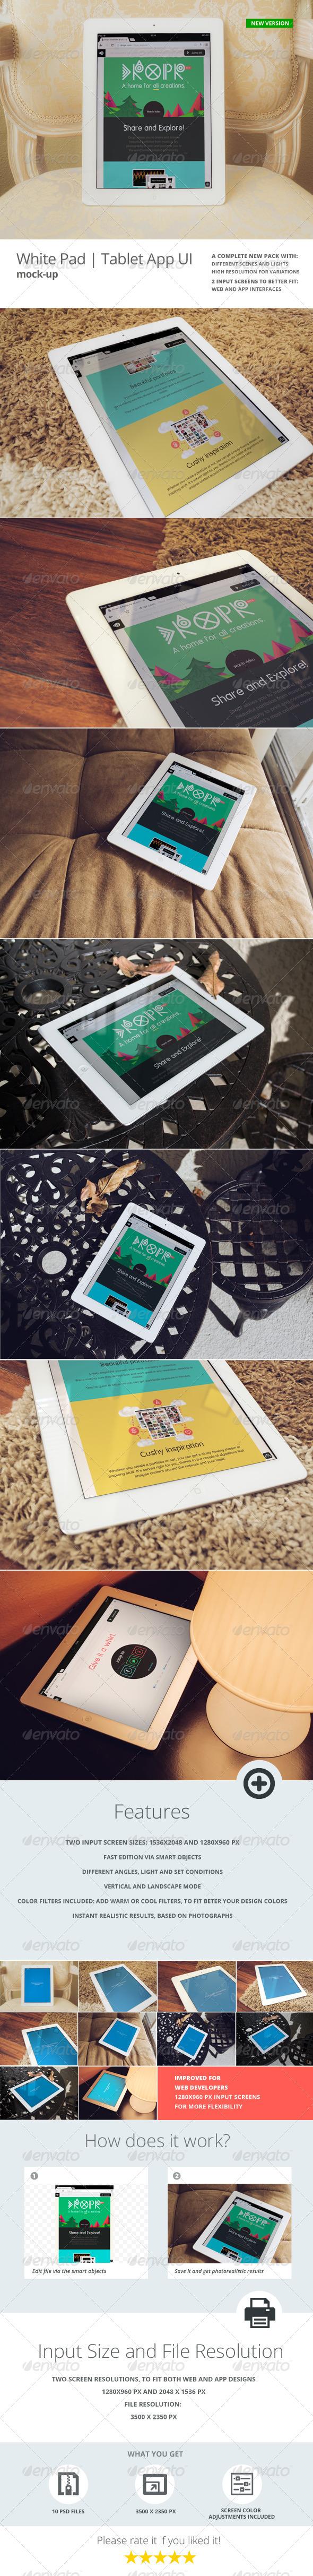 White Pad | Tablet App UI Mock-Up - Mobile Displays